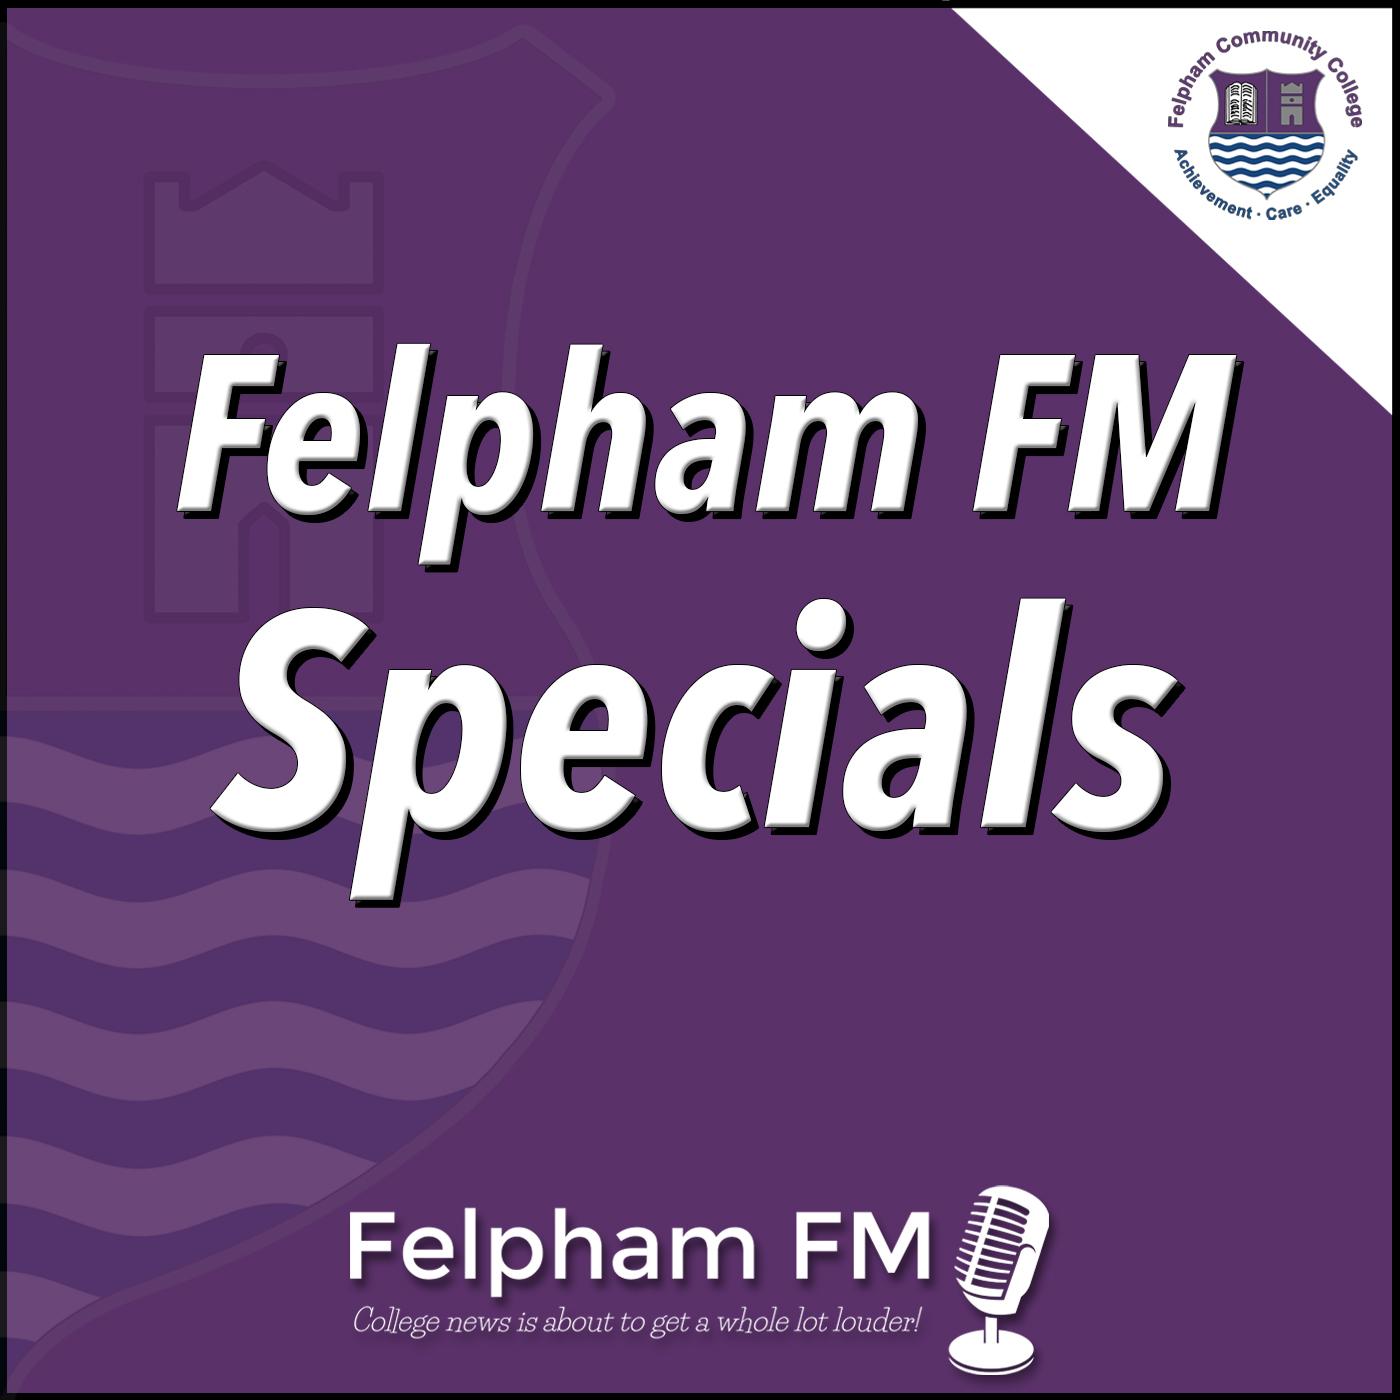 Felpham FM Specials